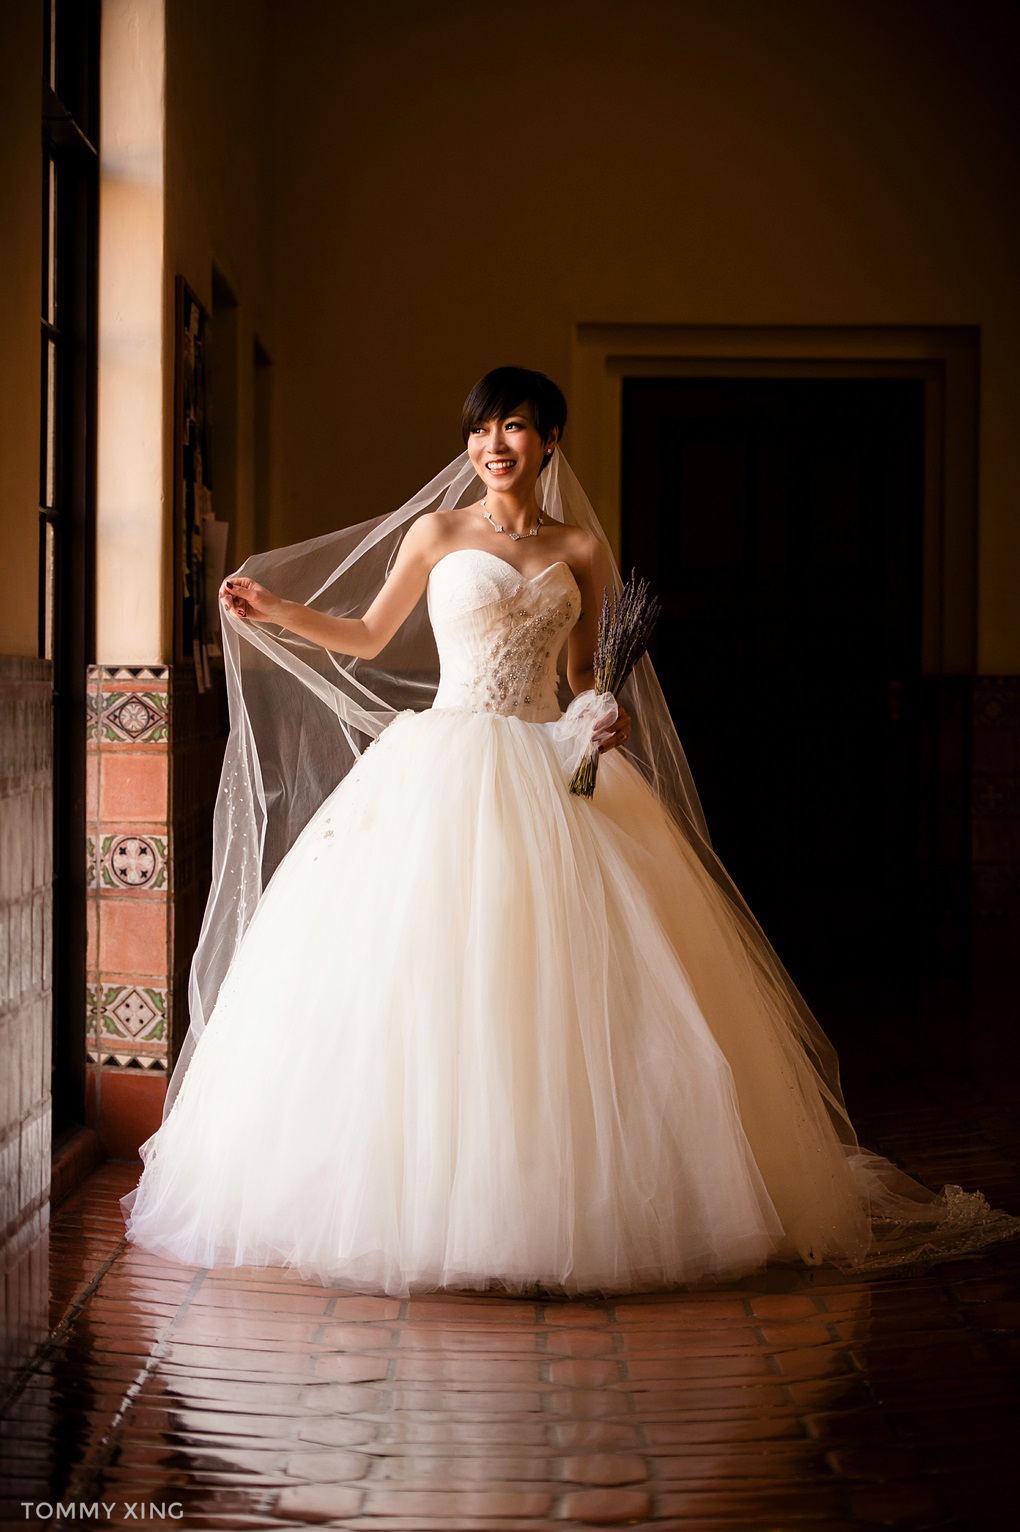 洛杉矶婚纱照 - Los Angeles Pre Wedding - Tommy Xing04.jpg